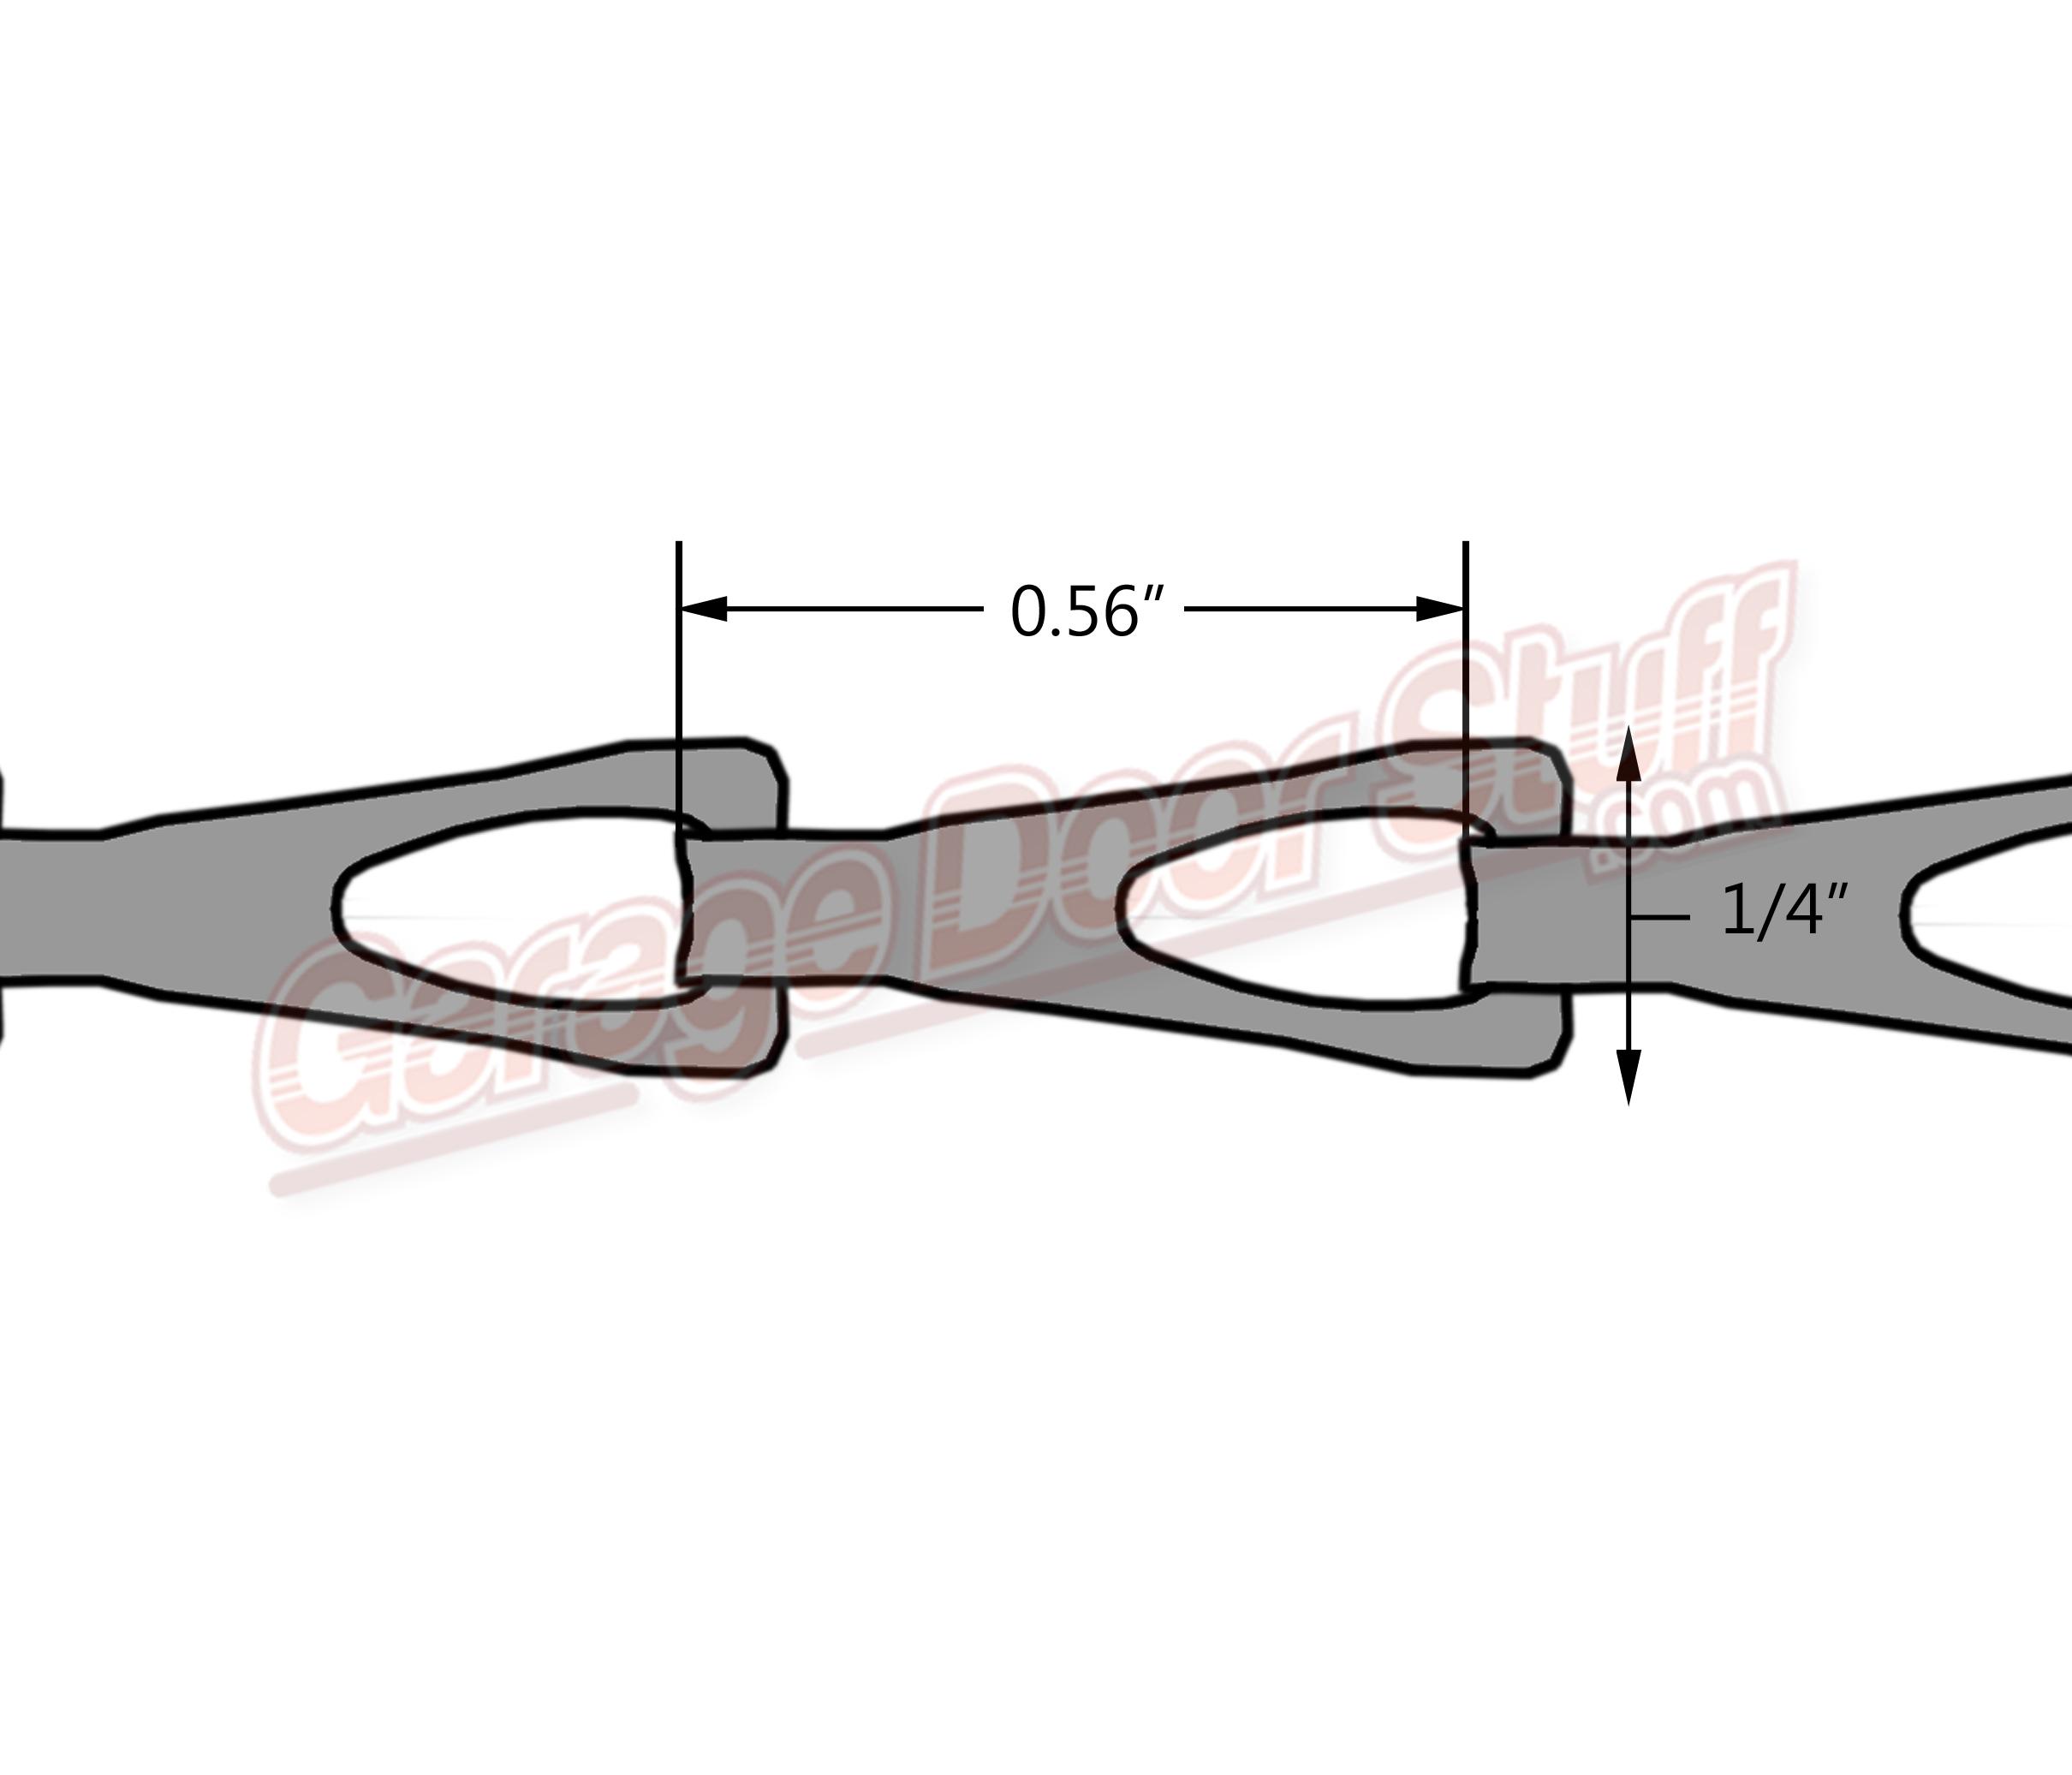 Ford F1 Wiring Diagram Ford Auto Fuse Box Diagram